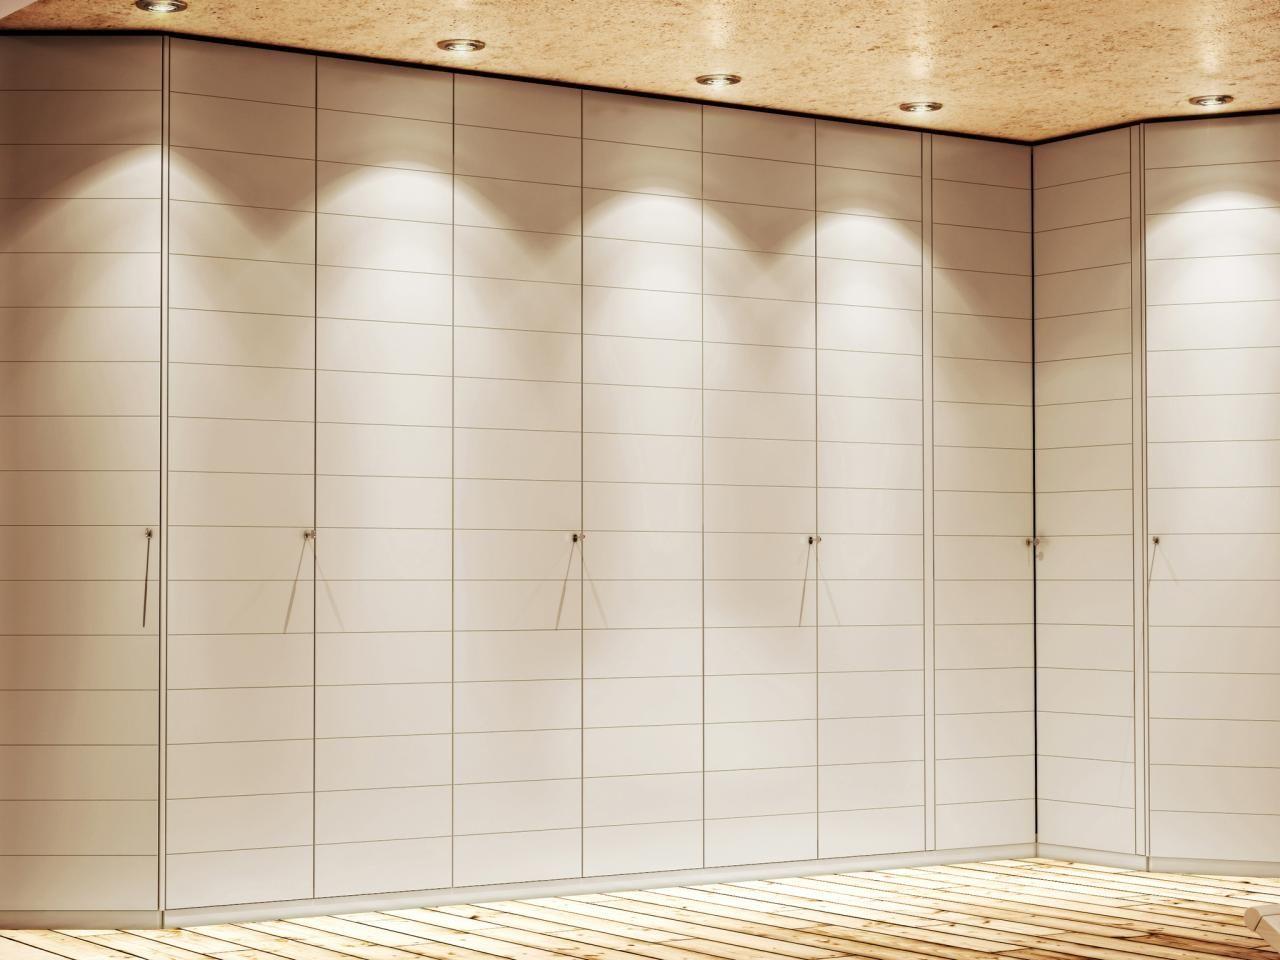 Sliding Closet Doors: Design Ideas And Options